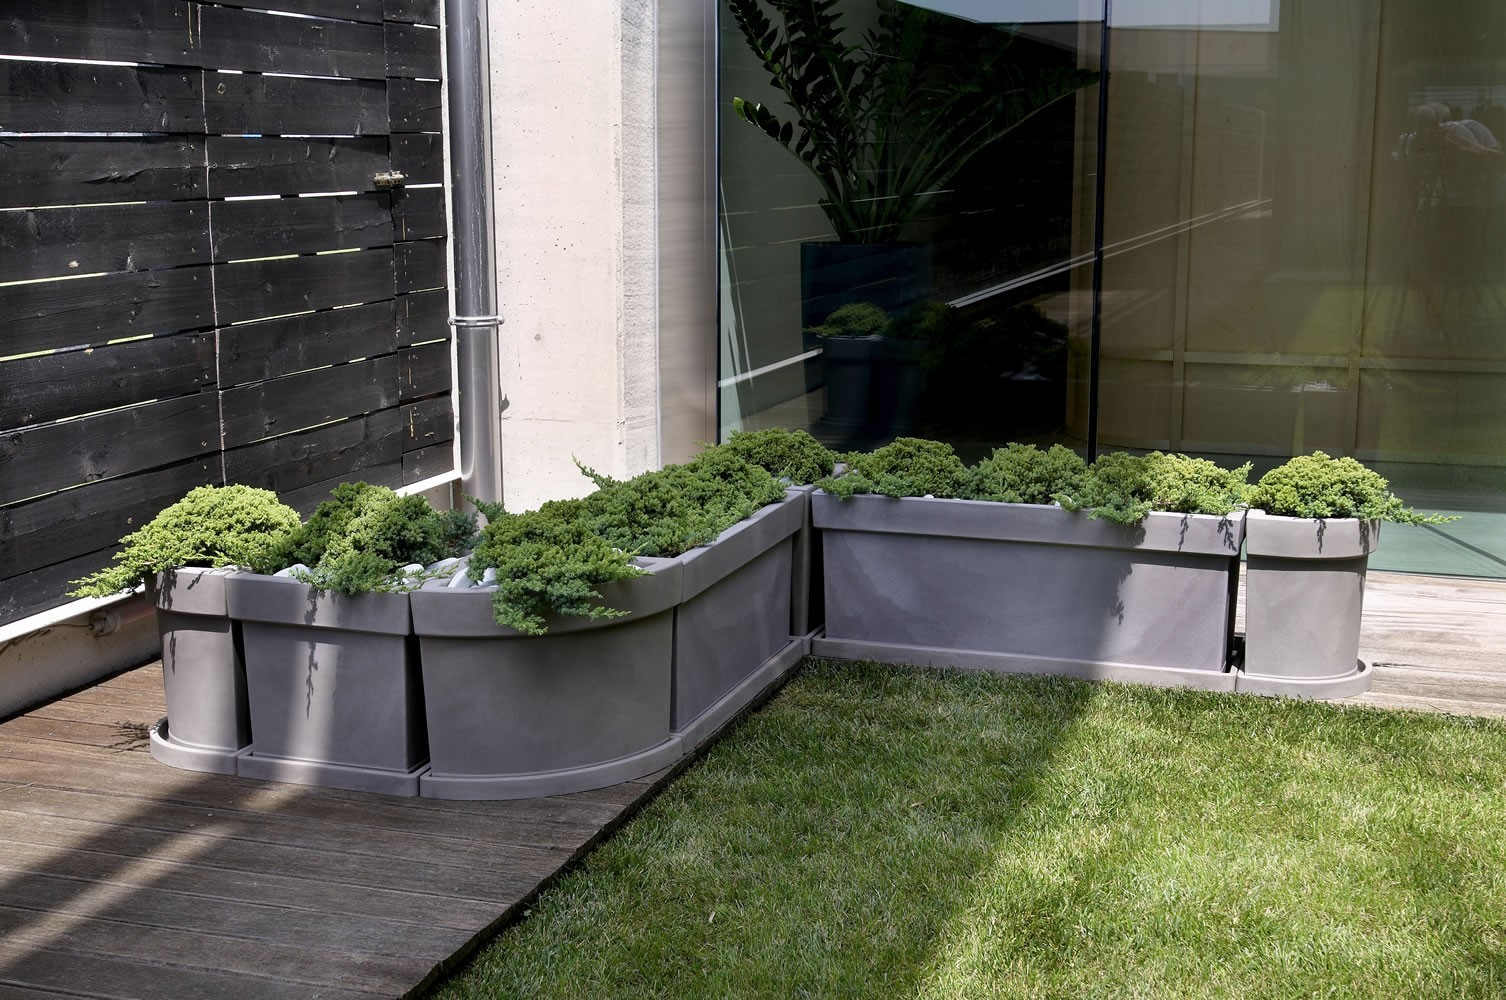 Sottovaso themis per vasi angolari nicoli - Vasi in giardino ...